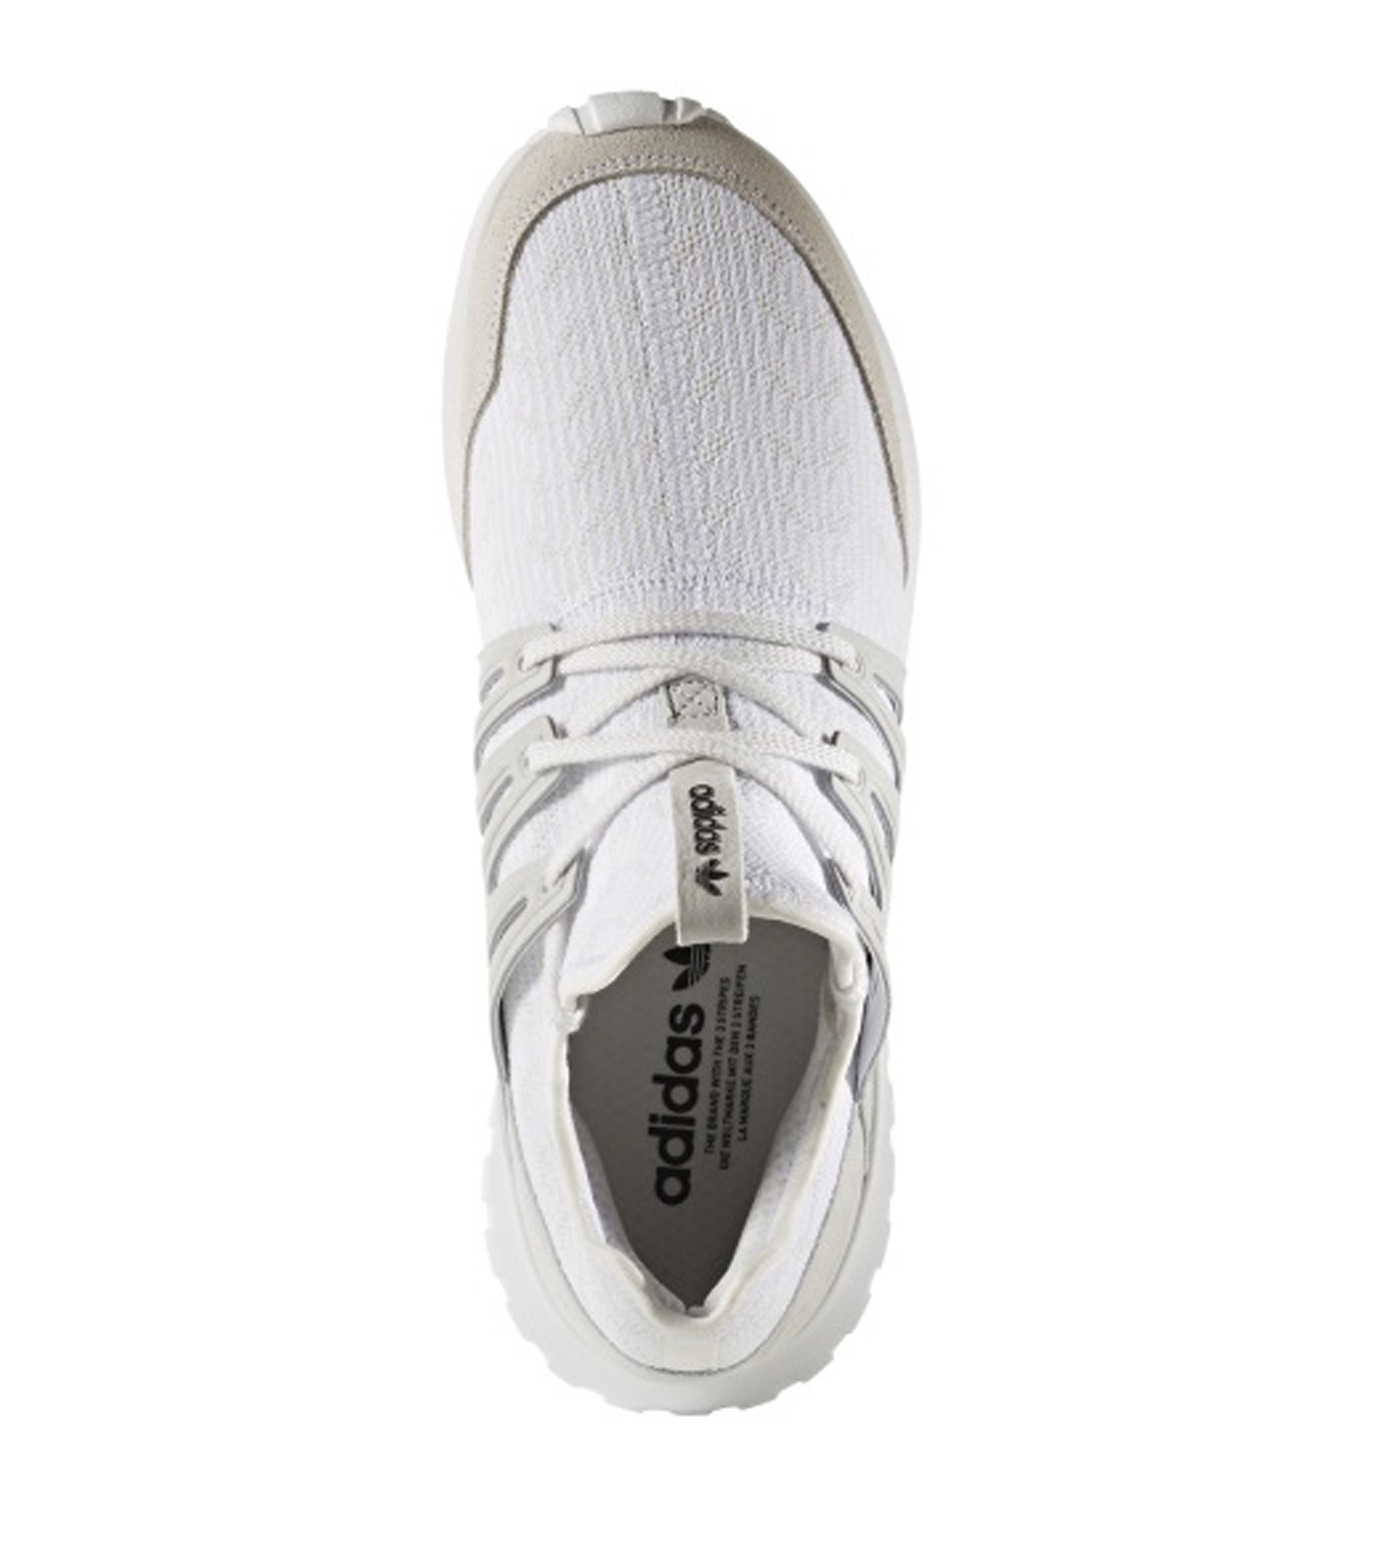 adidas(アディダス)のTUBULAR RADIAL PK-WHITE(シューズ/shoes)-S76714-4 拡大詳細画像4